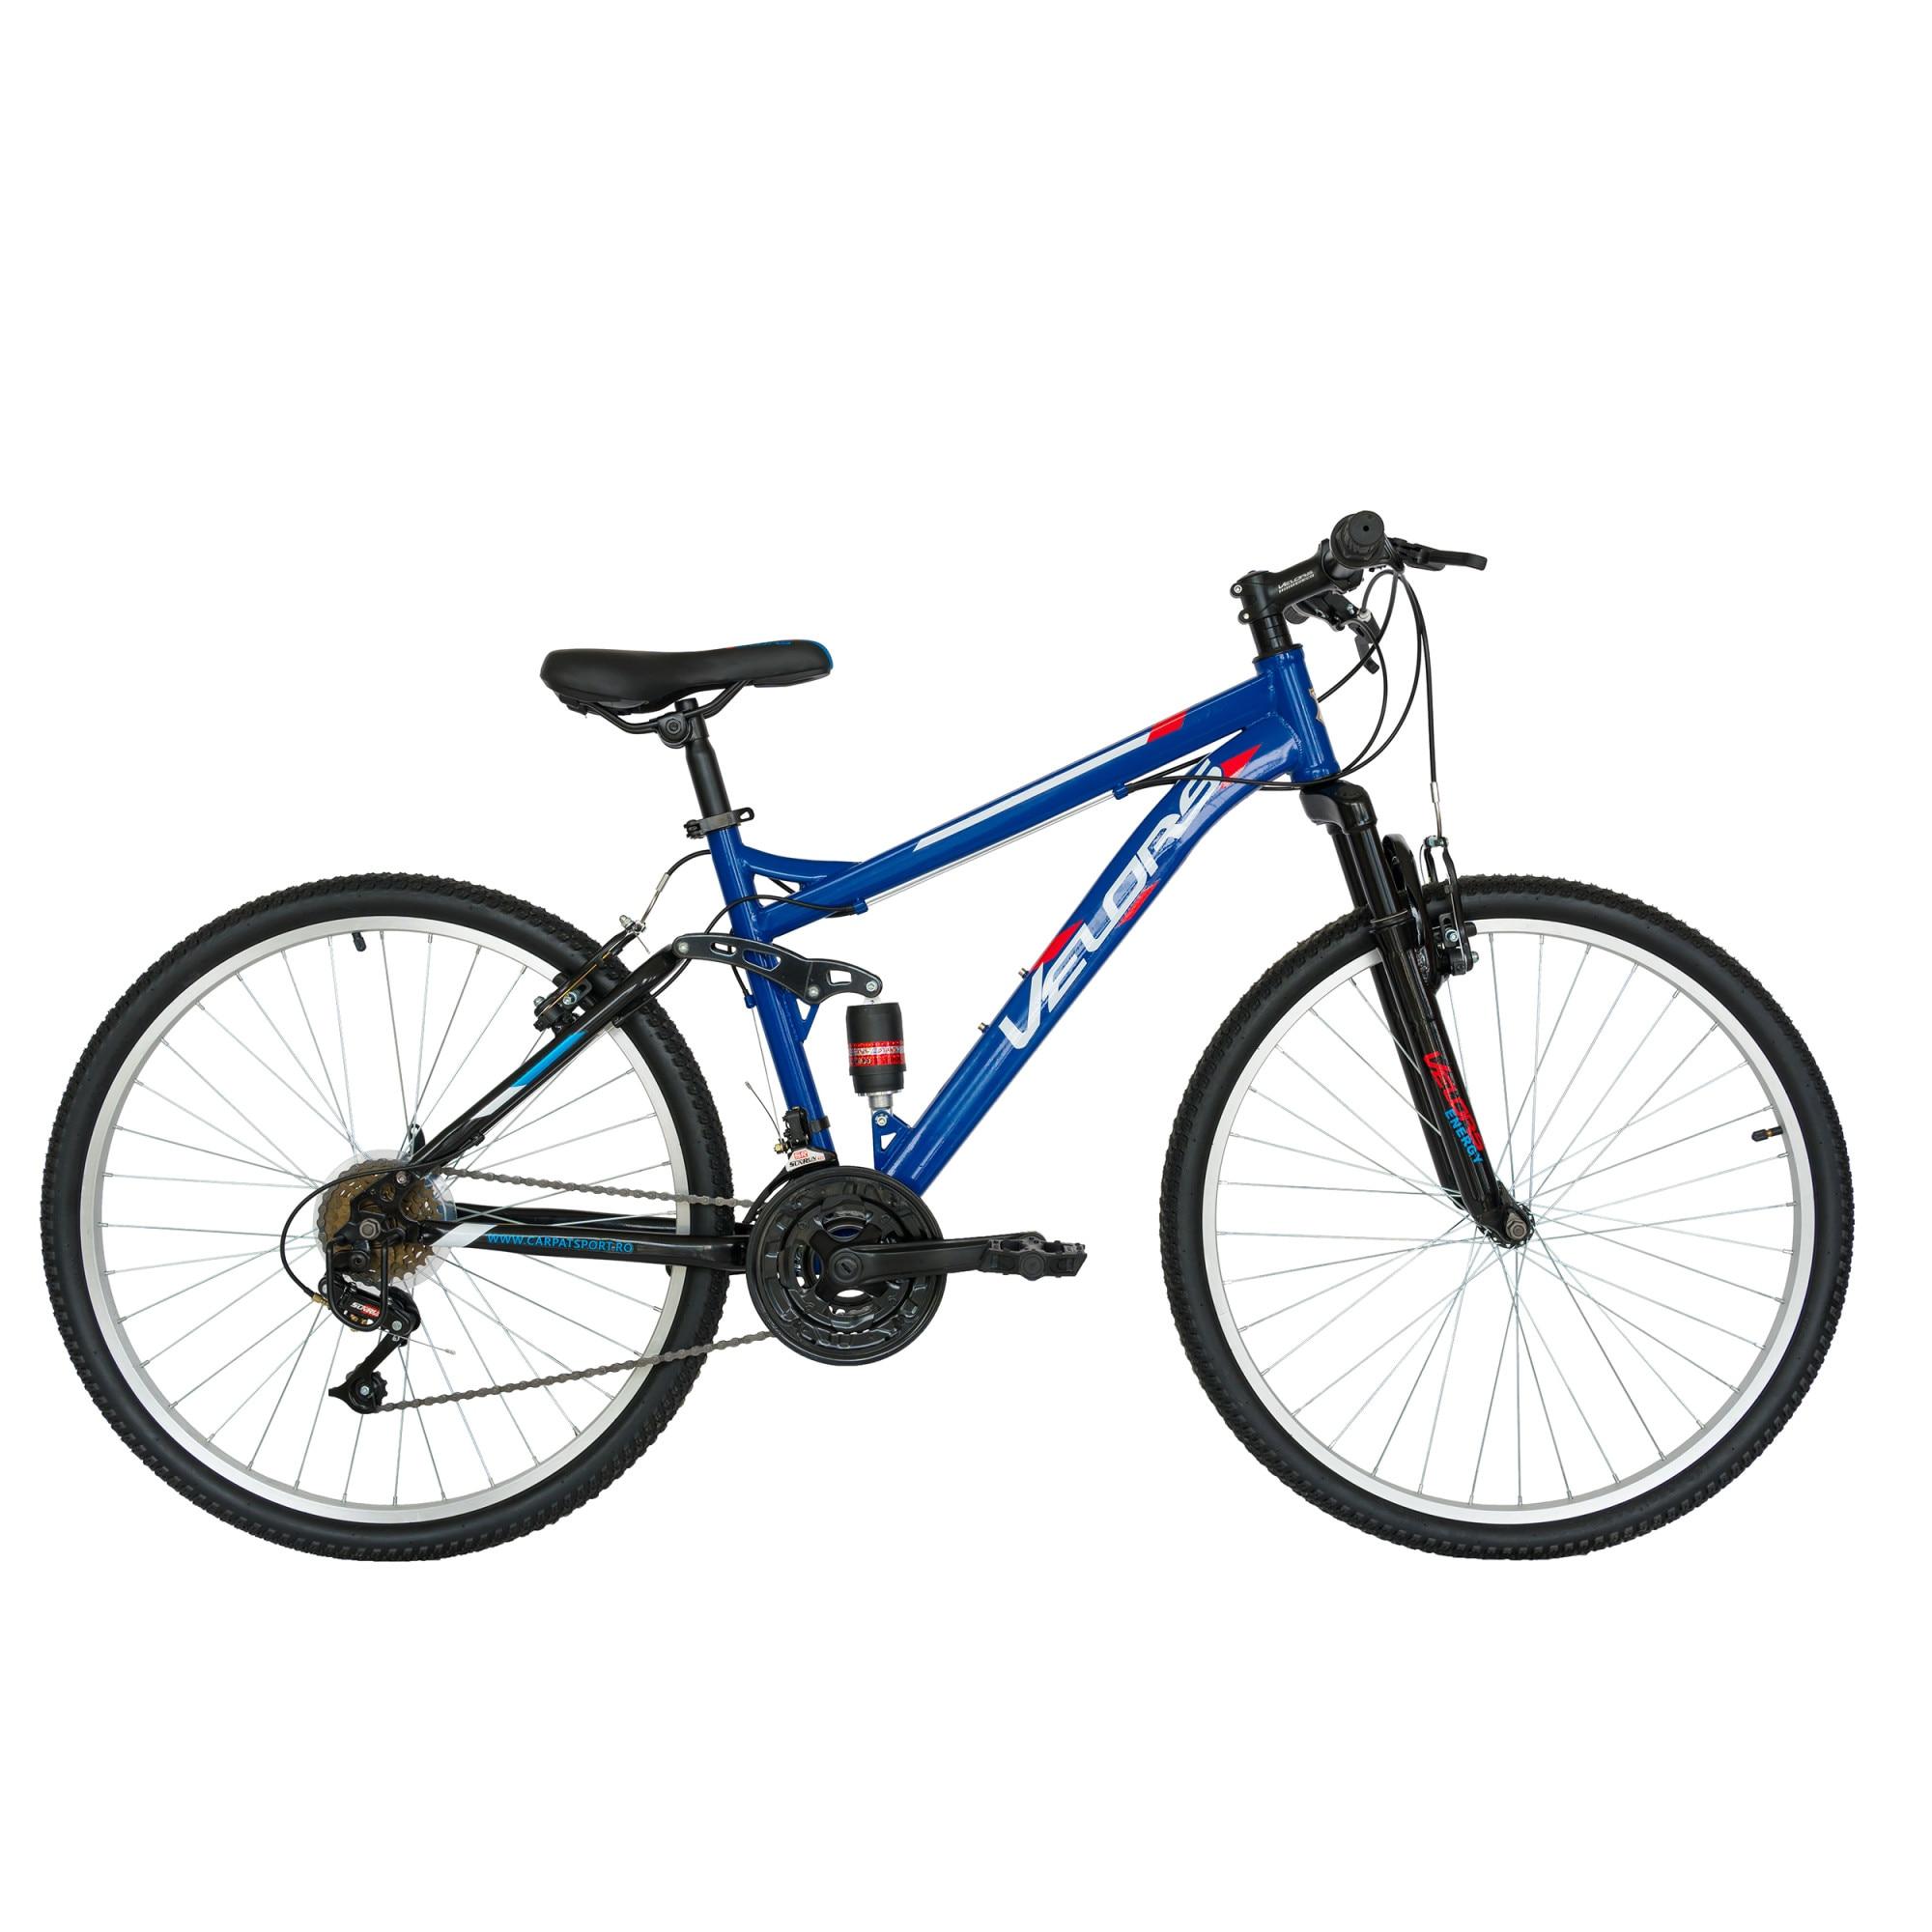 "Fotografie Bicicleta Velors Full Suspesion 26"" V2660A, Albastru/Negru"